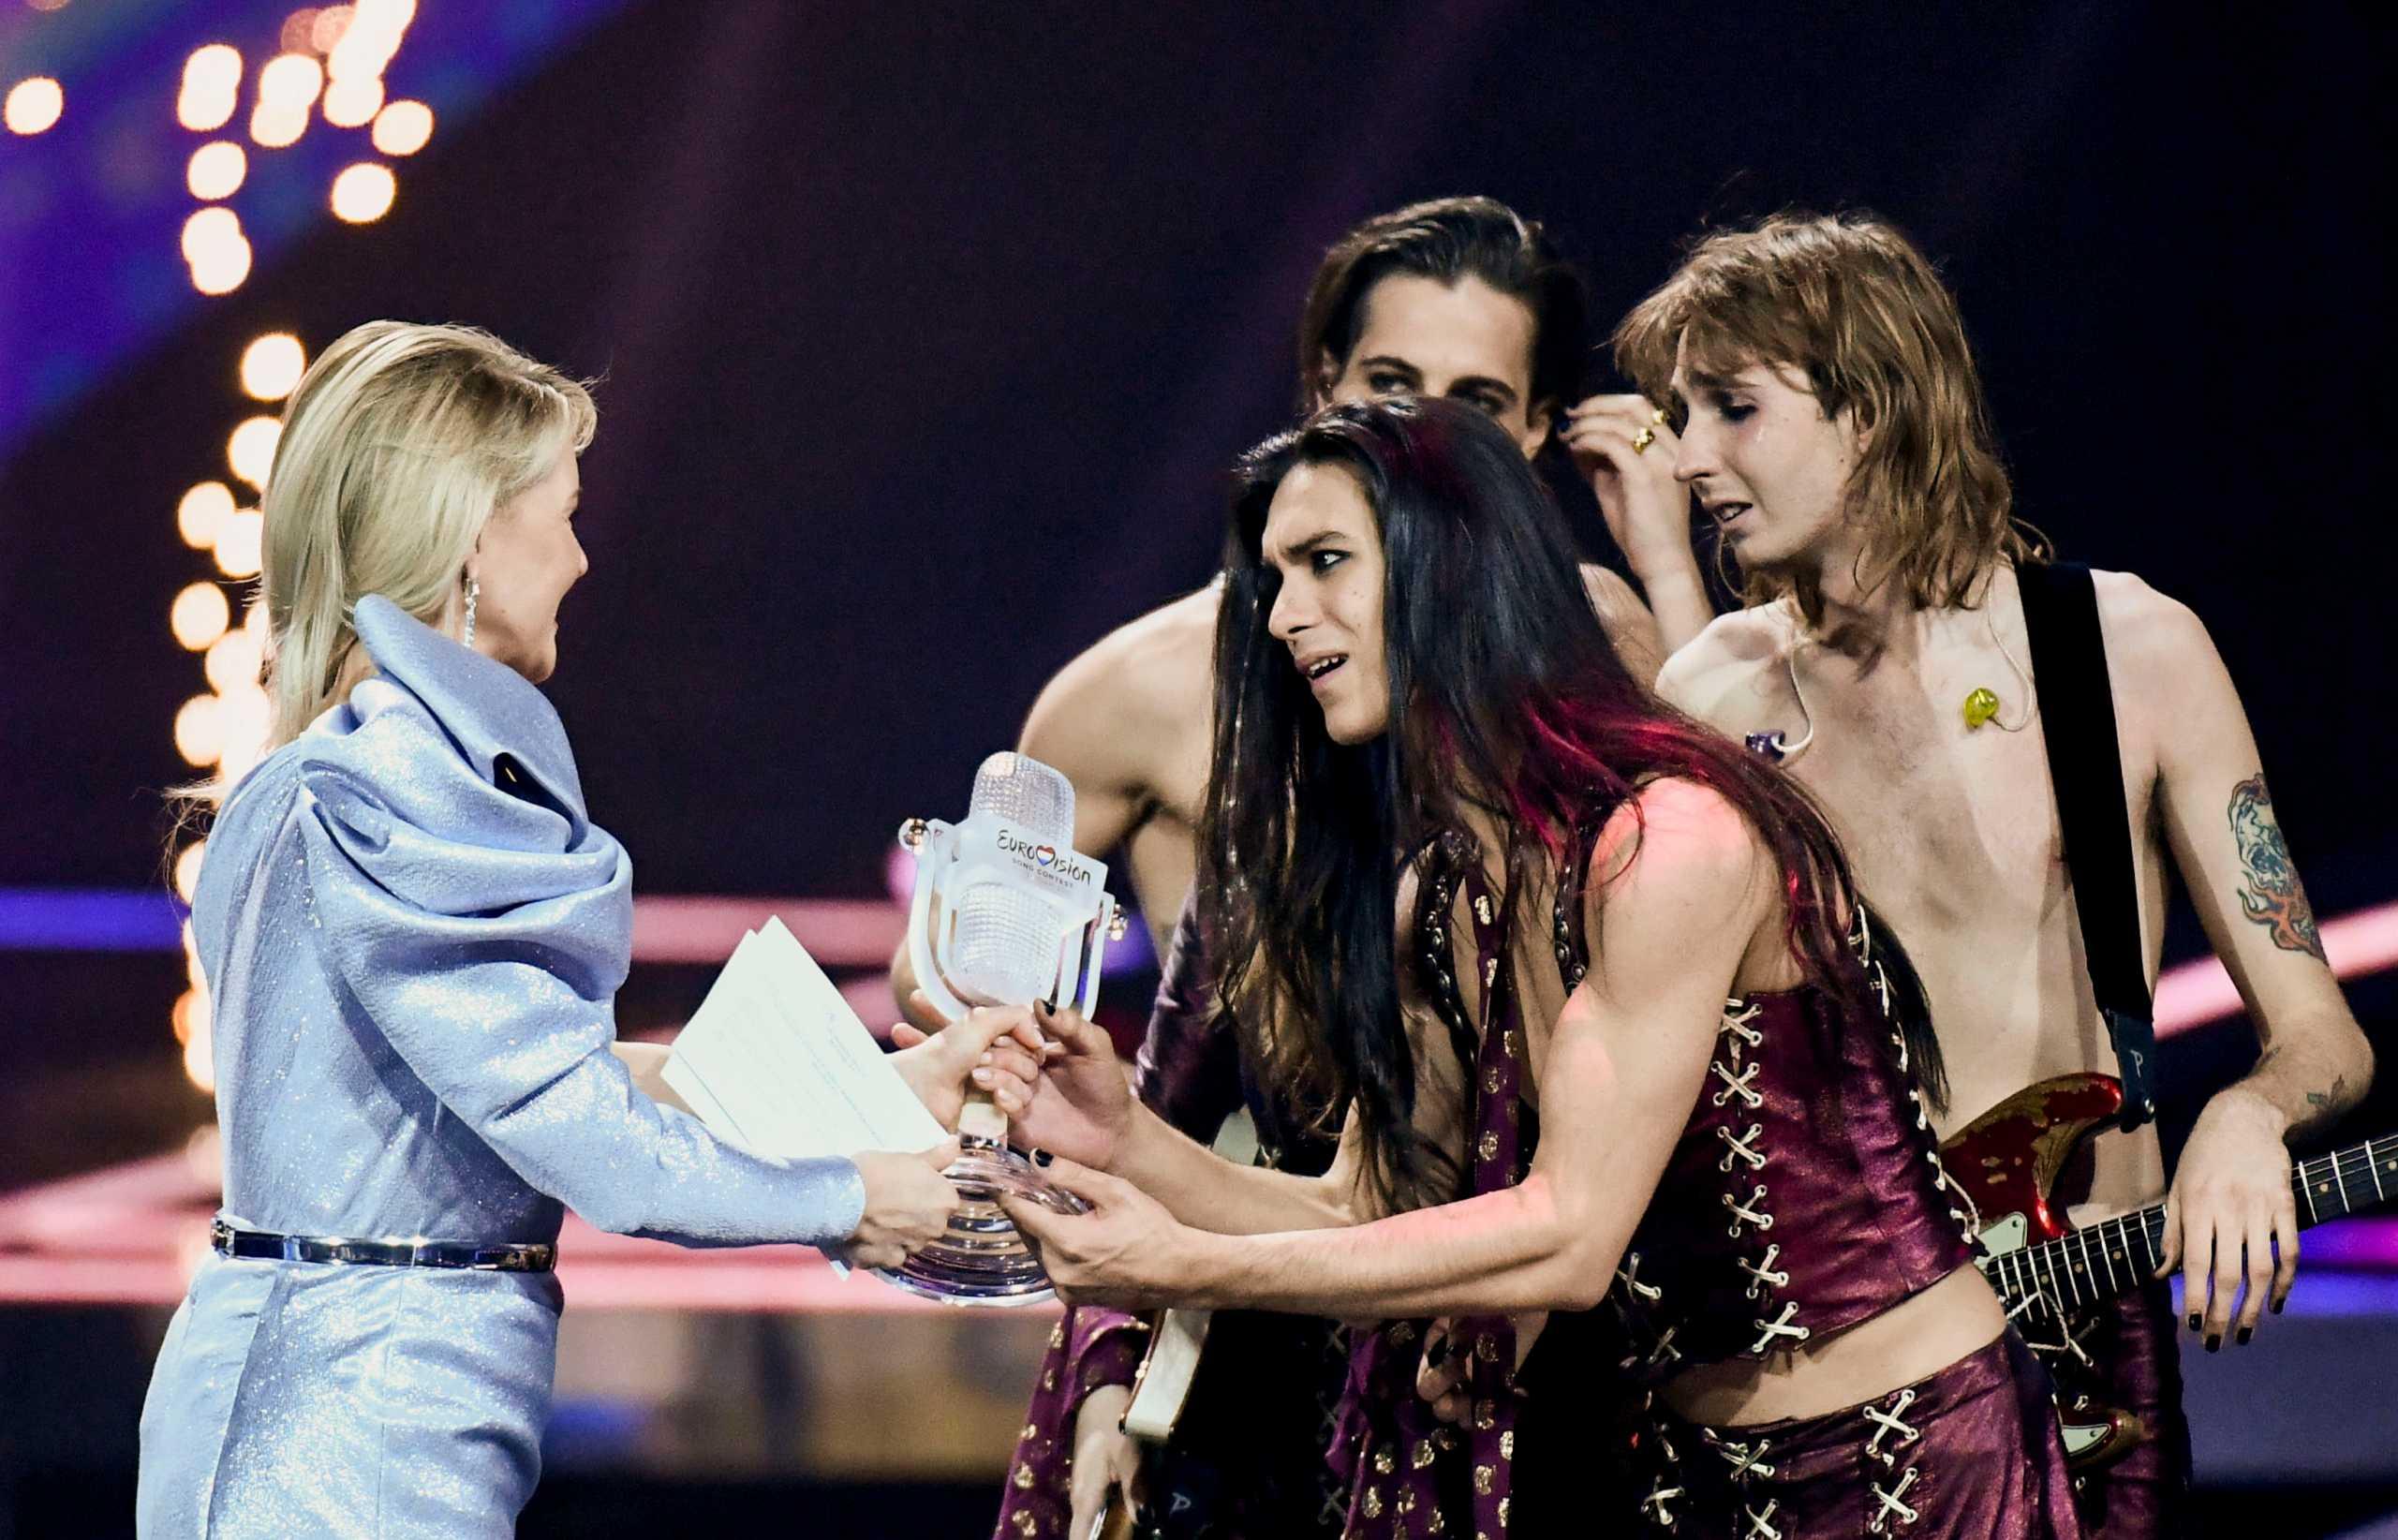 Eurovision 2021 – Damiano David: Ο τραγουδιστής της Ιταλίας κατηγορείται για χρήση κοκαΐνης (video)